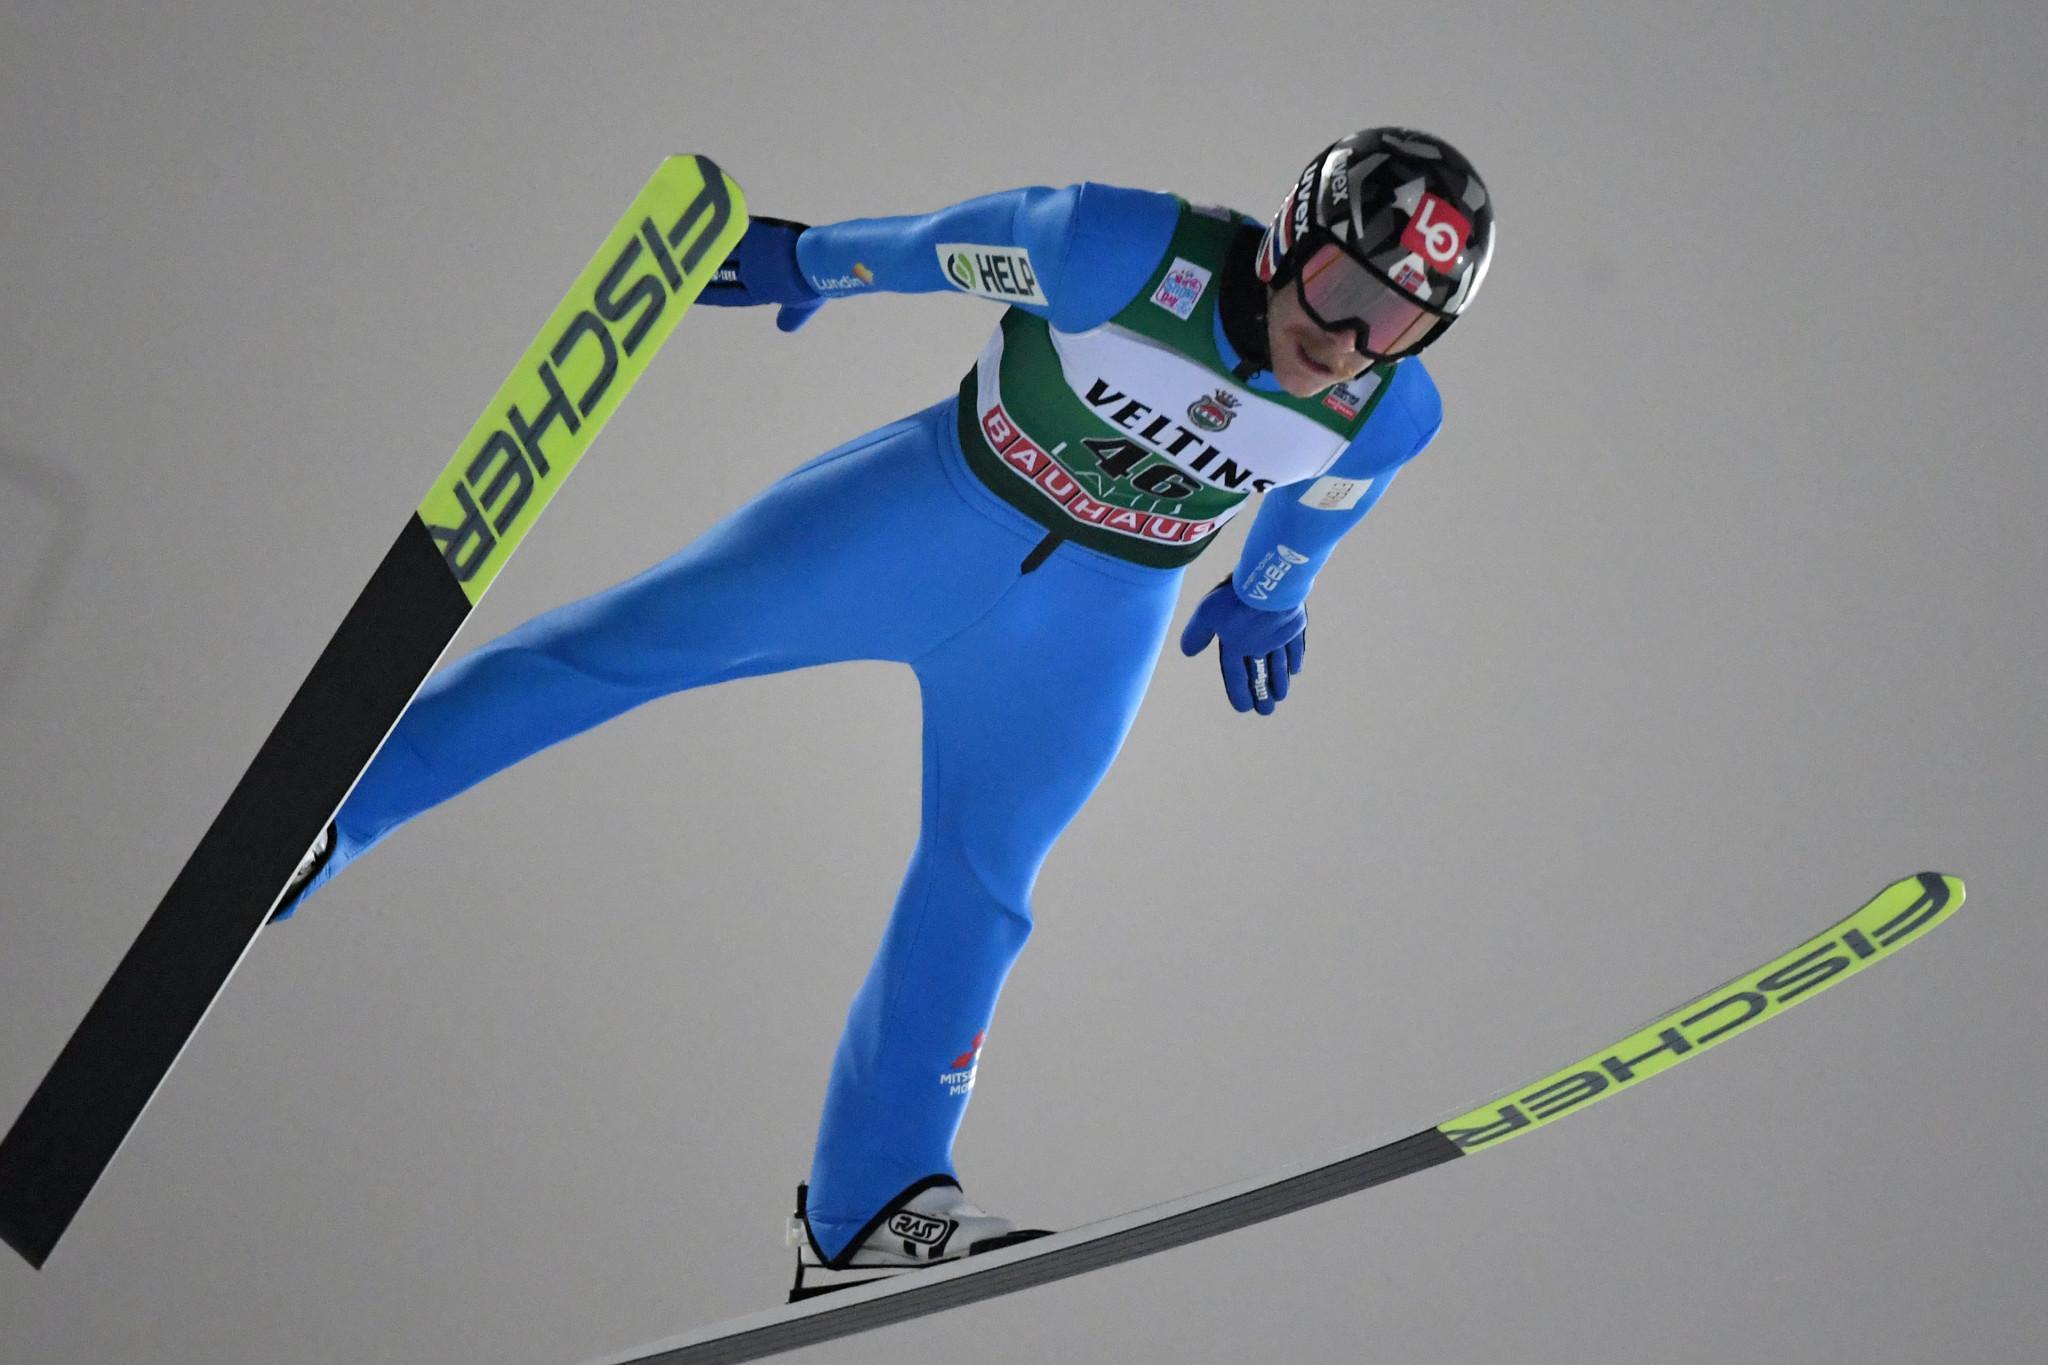 Consistent Johansson picks up third career Ski Jumping World Cup win